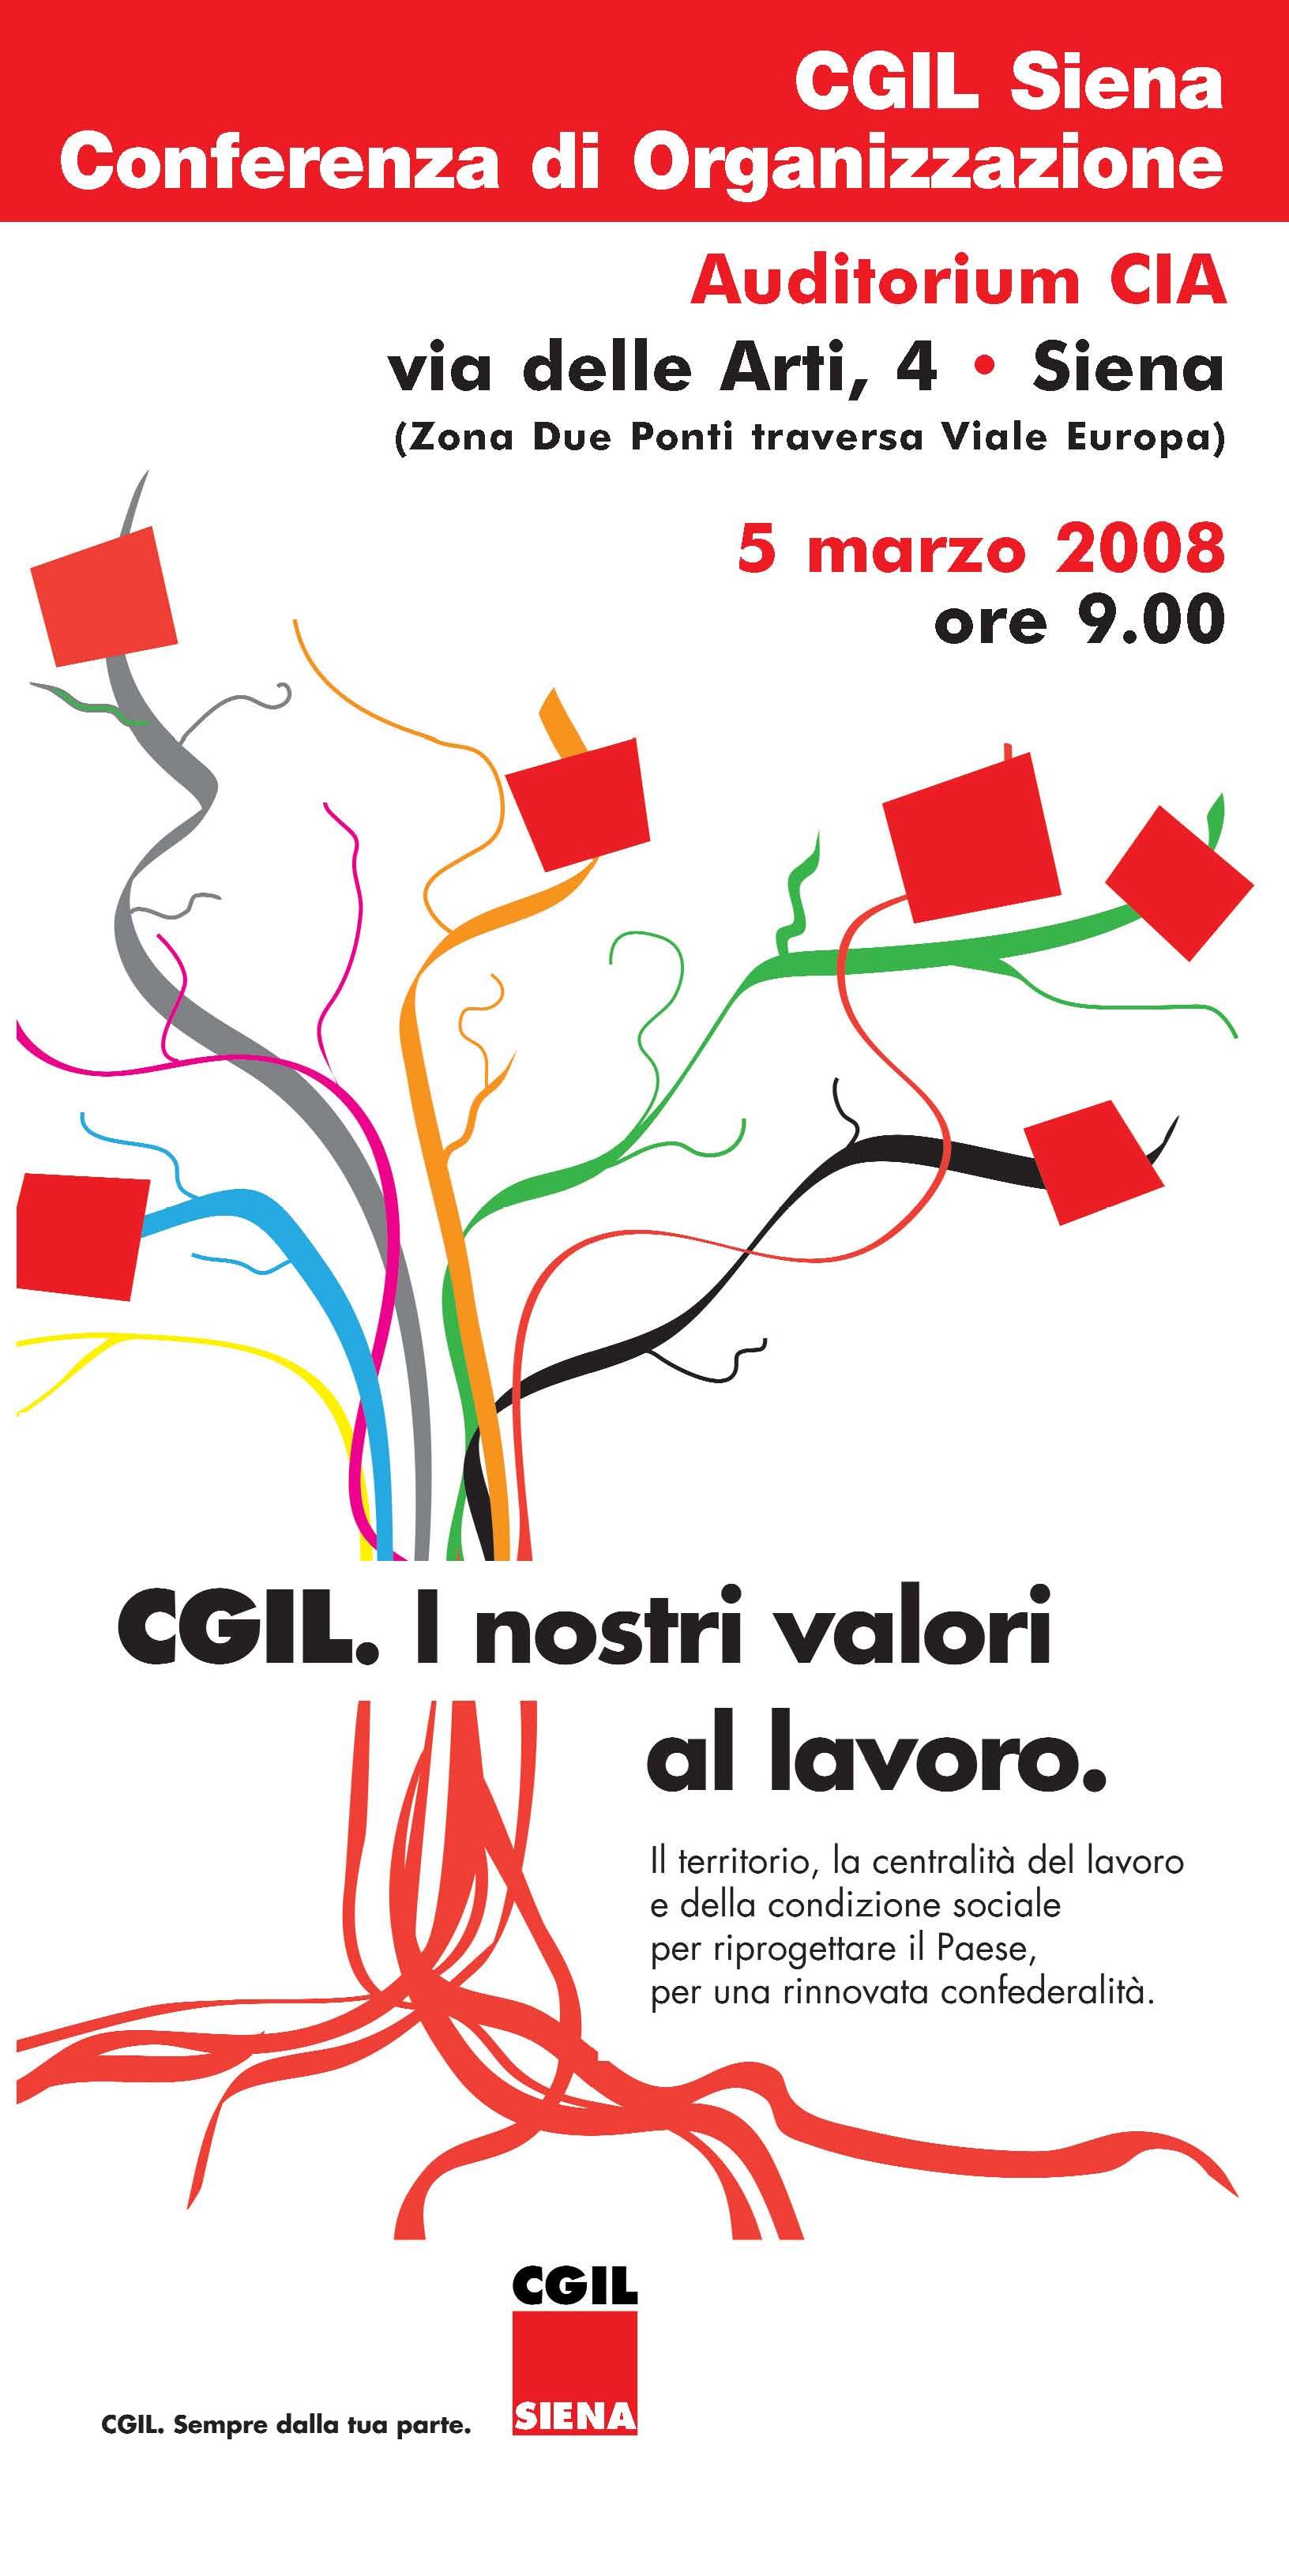 invito-conf-org-cgil-siena-050308_page_1.jpg